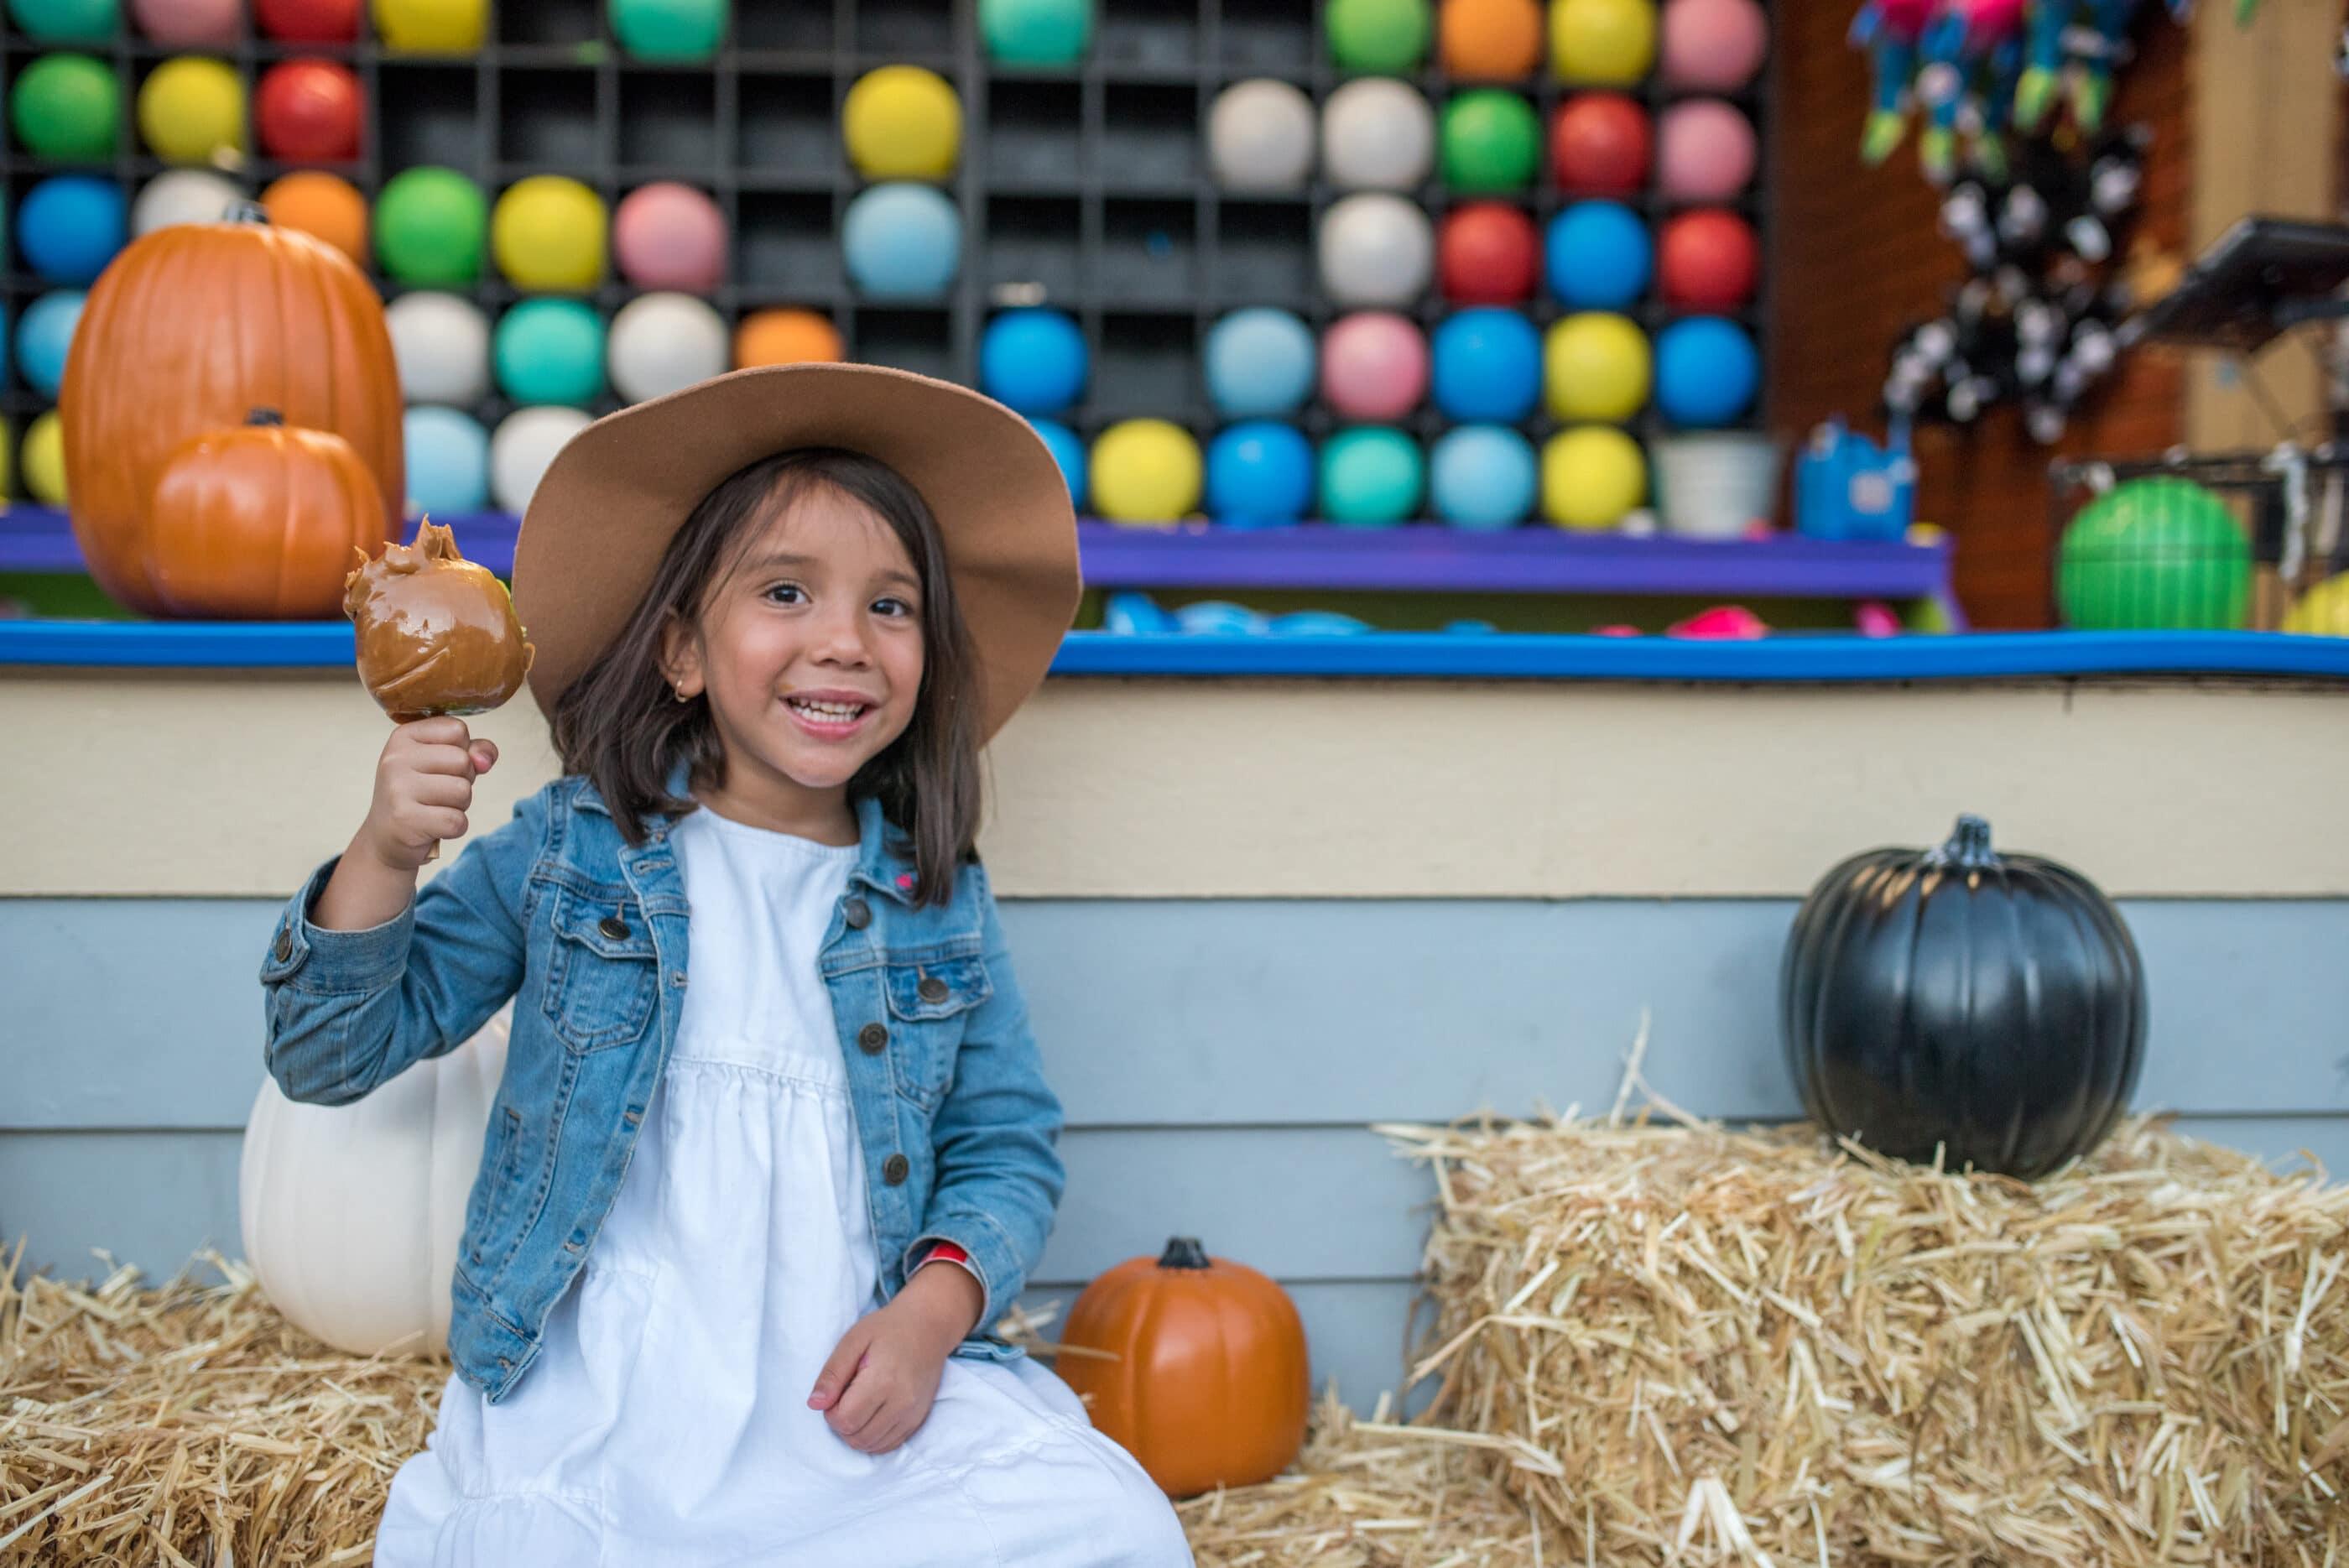 A girl eats a candy apple at Harvest Walk.